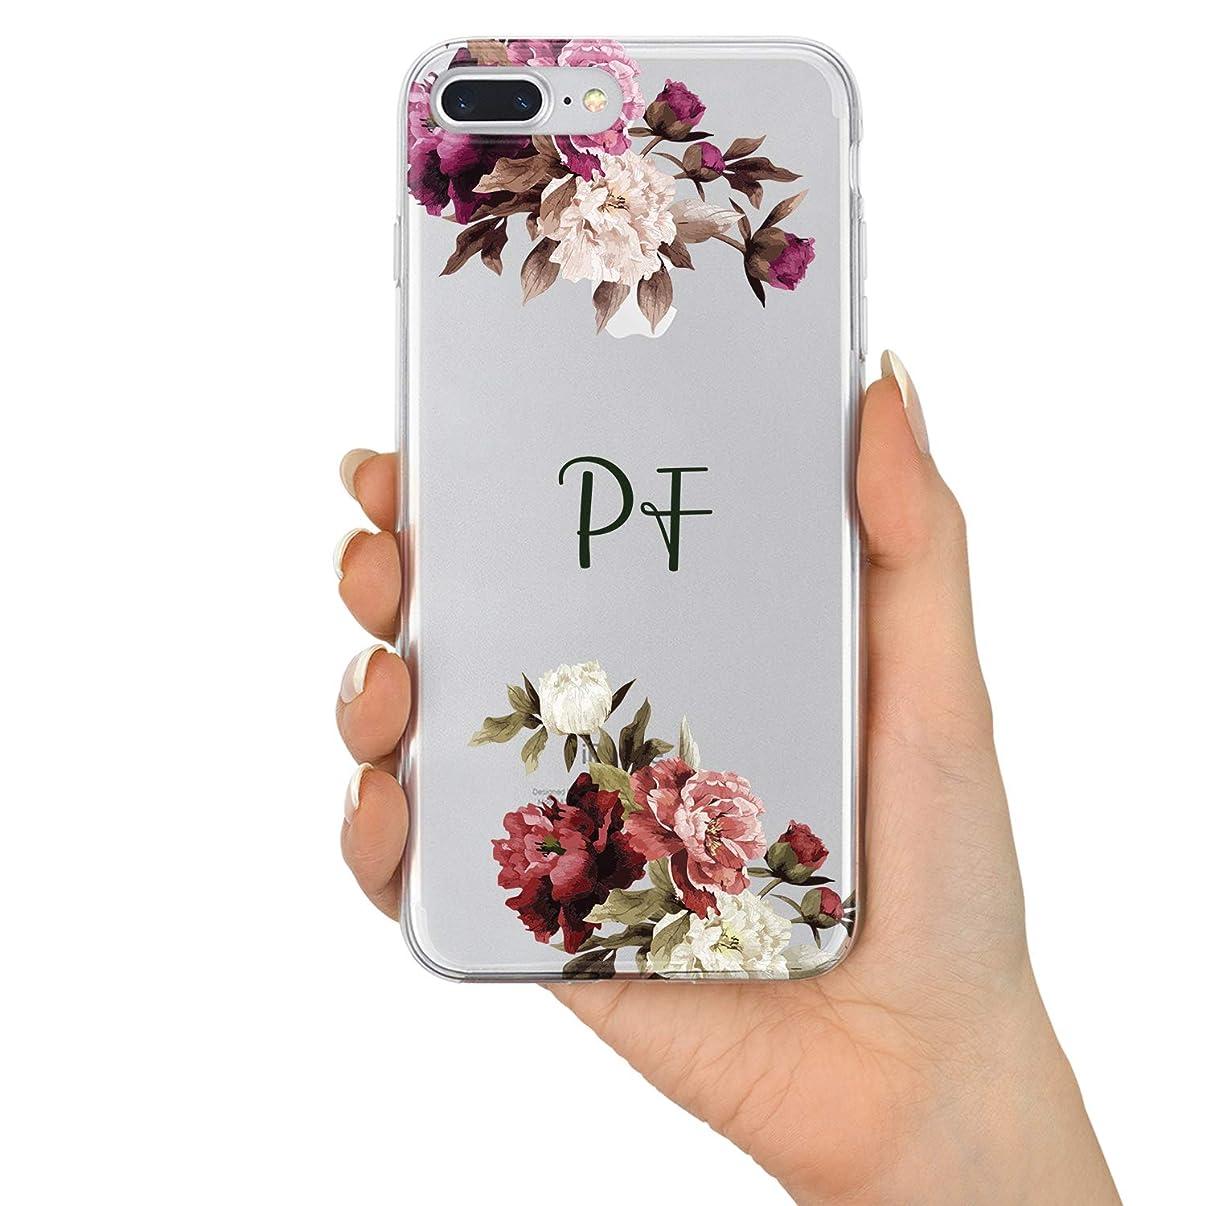 TULLUN Custom Floral Design Personalized Name Initials Monogram Flexible Clear Soft Gel Phone Case Cover for iPhone - Floral Initials V3 - for iPhone 6 / 6s